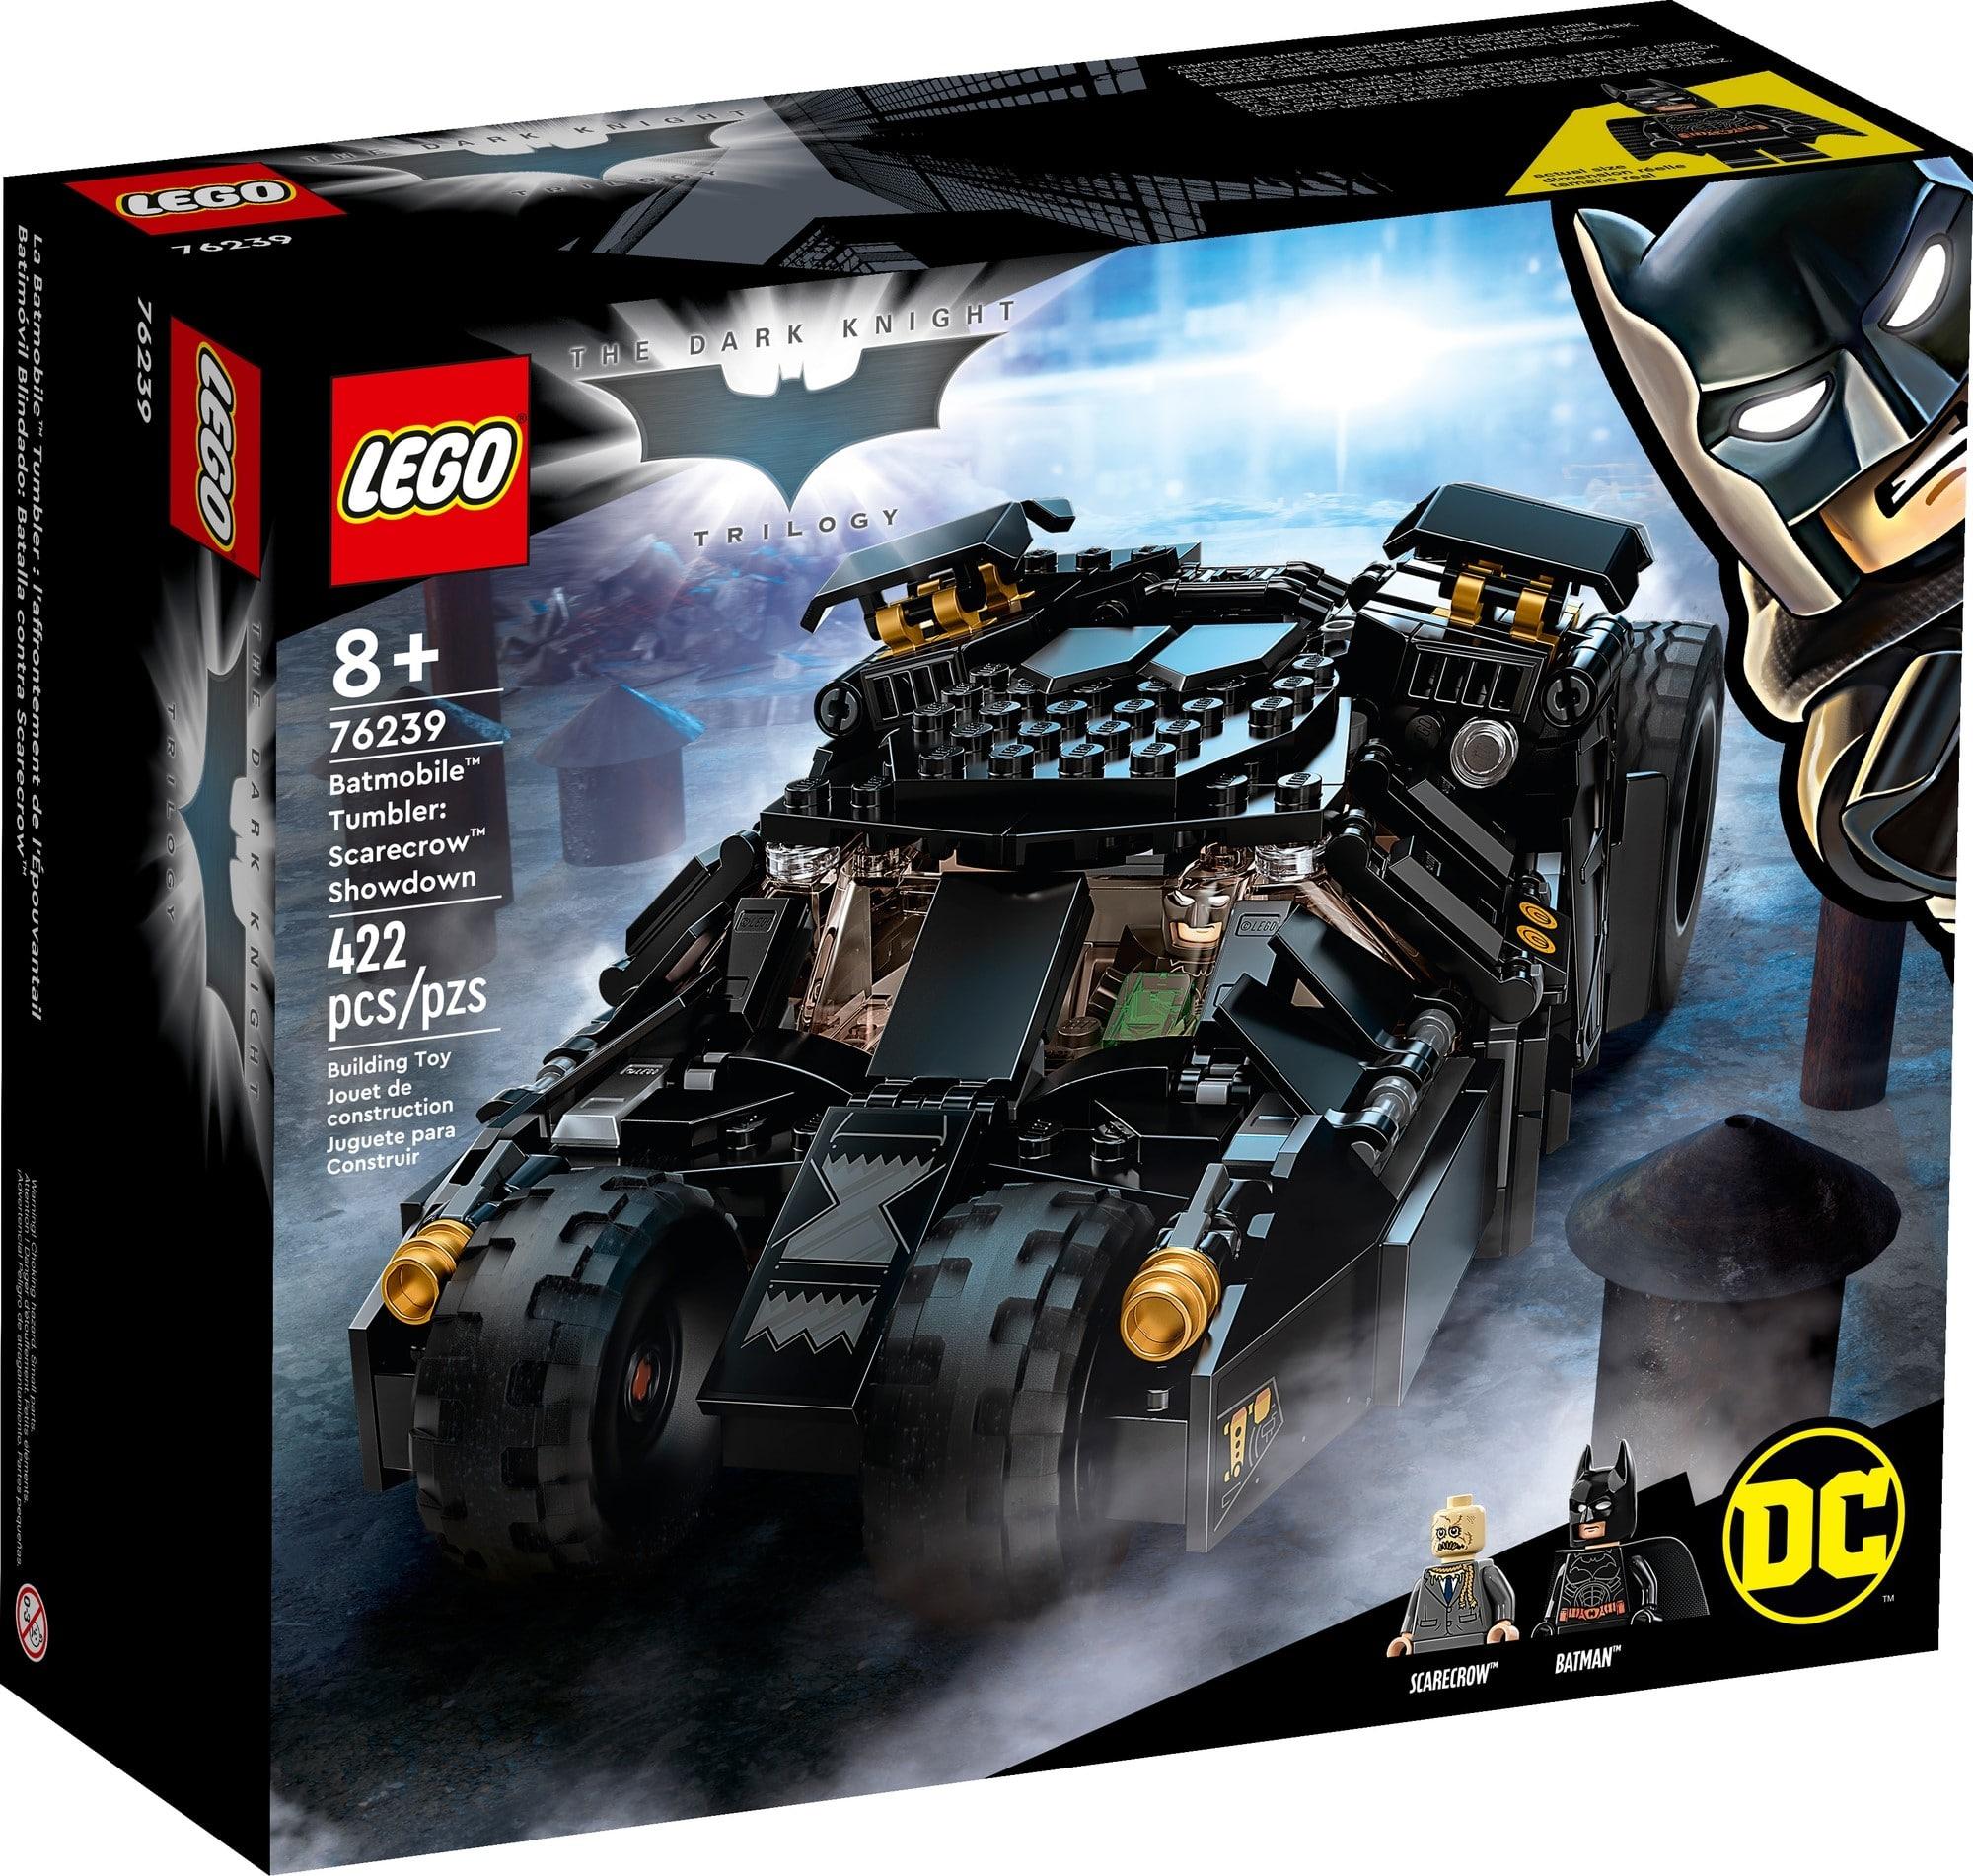 LEGO Dc 76239 LEGO Dc Batman Batmobile Tumbler Duell Mit Scarecrow 2